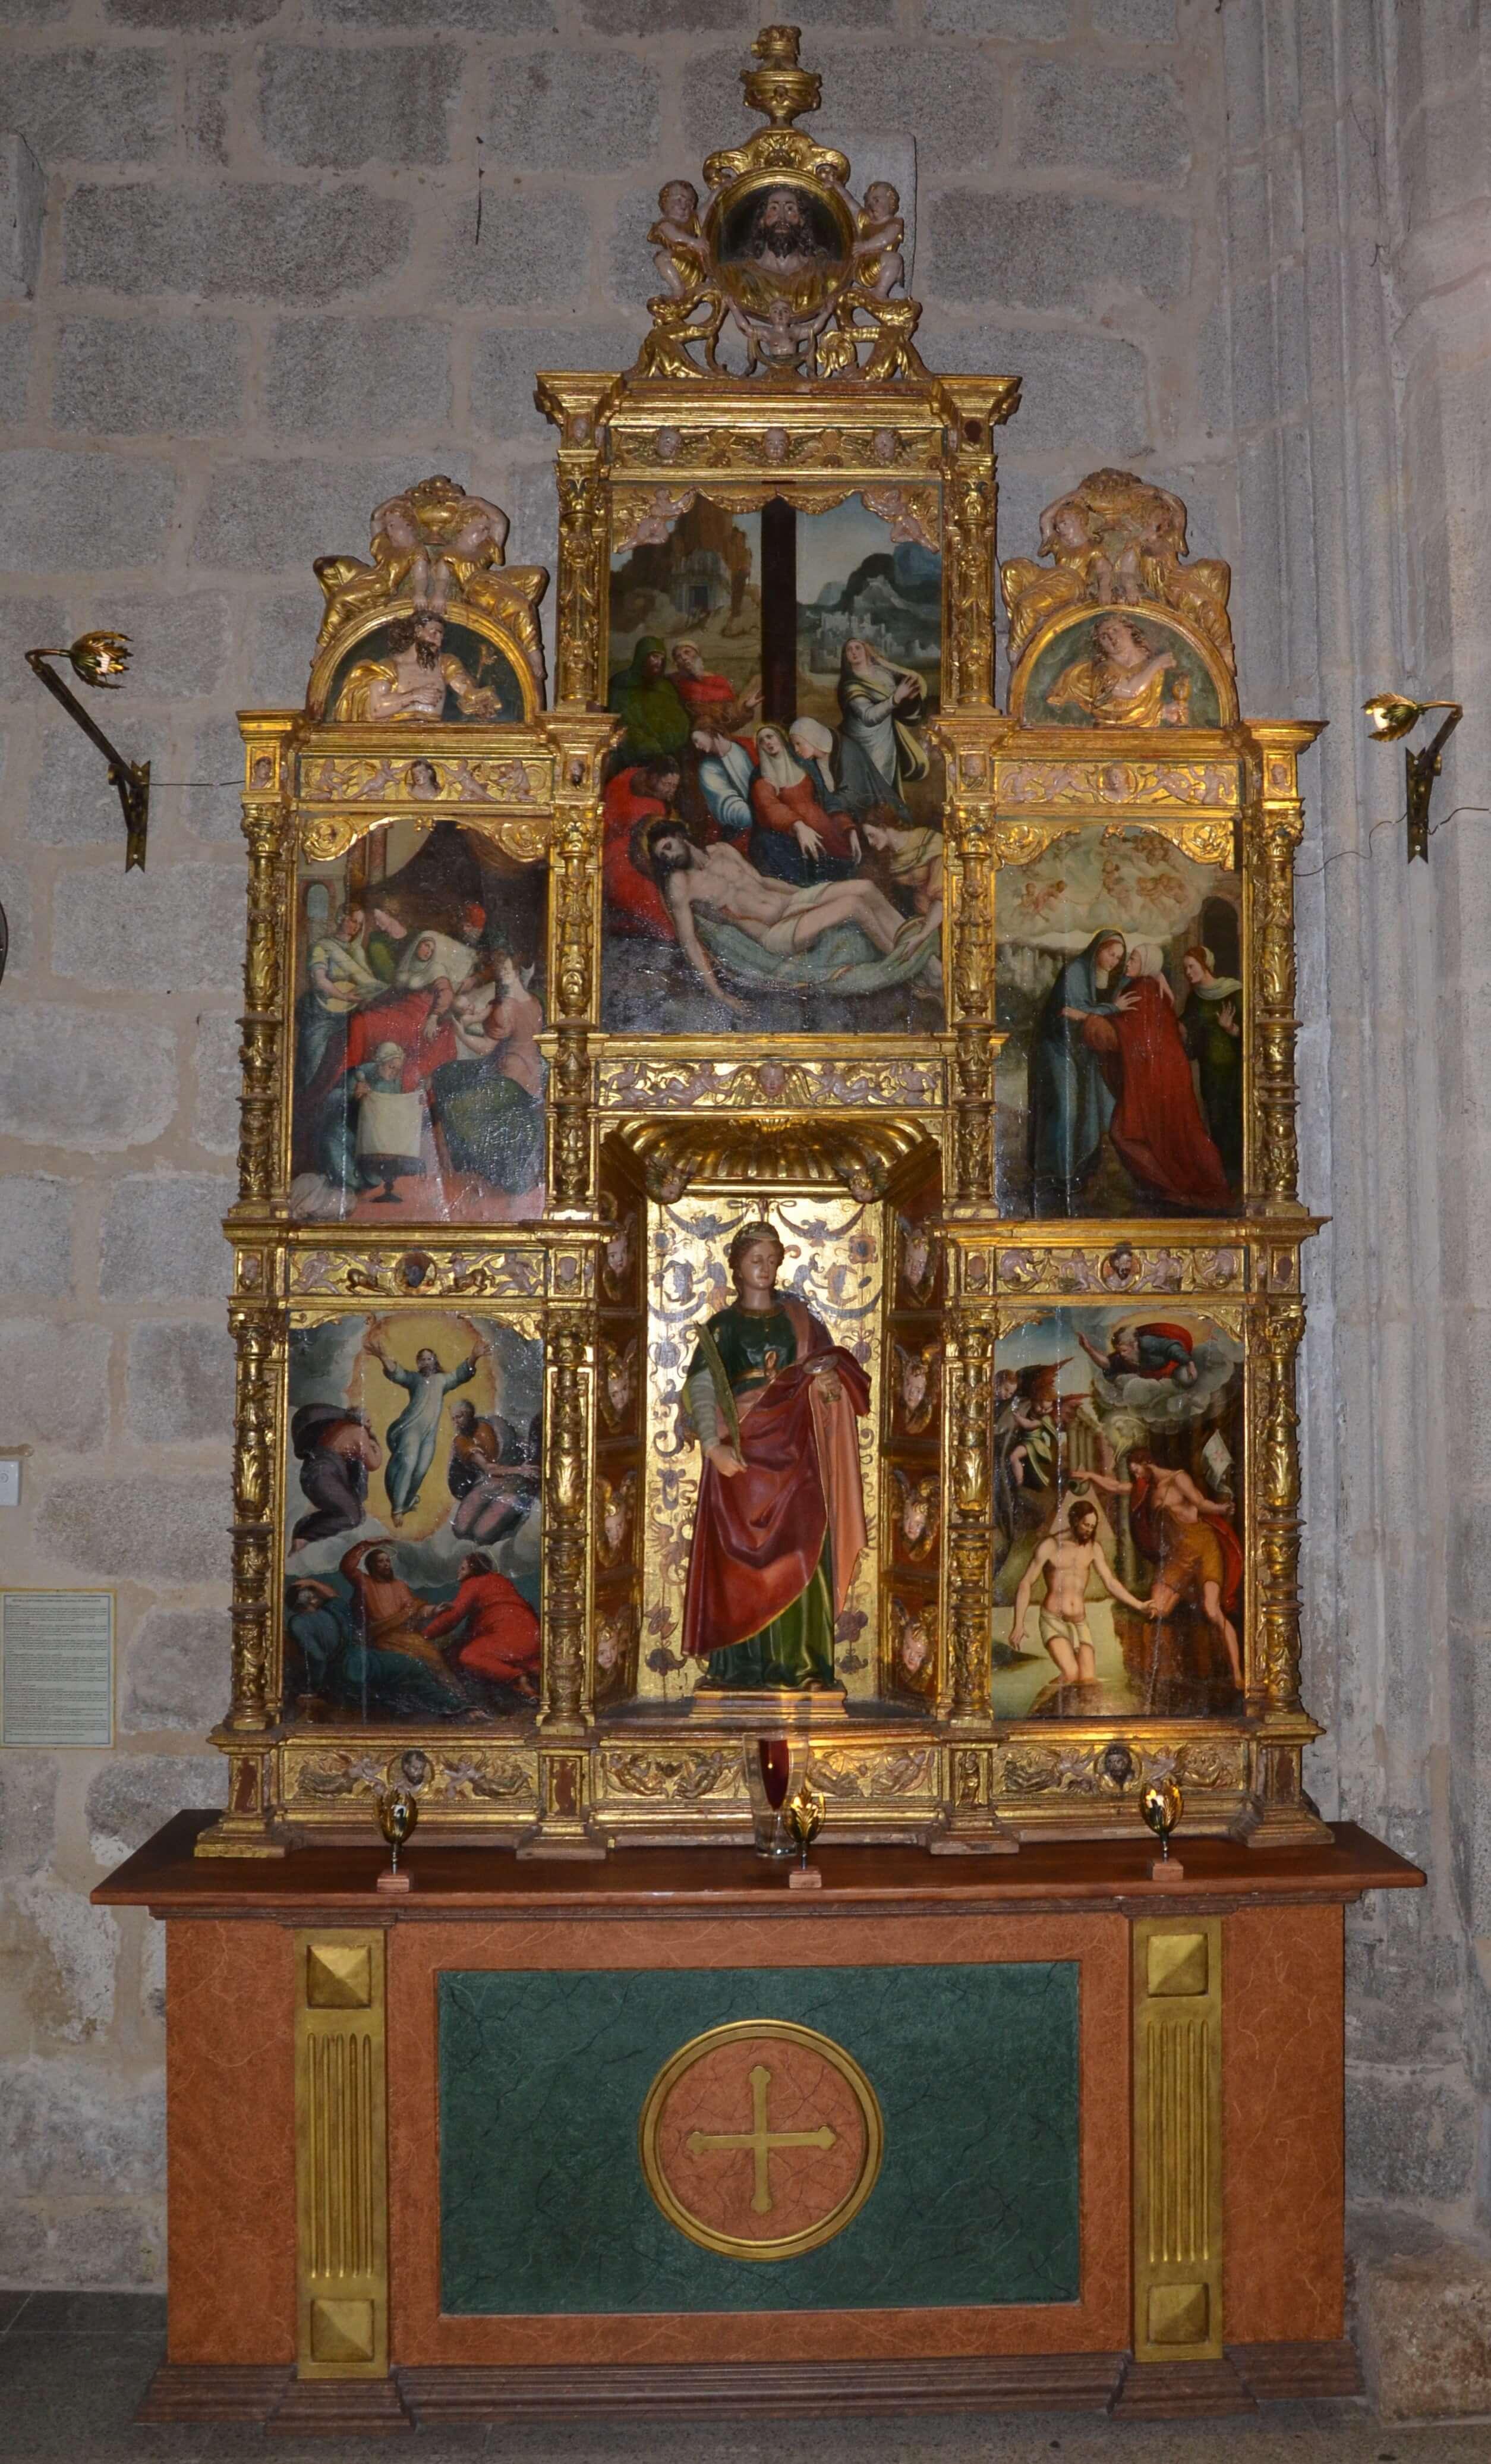 retablo atribuido a Alonso Berruguete